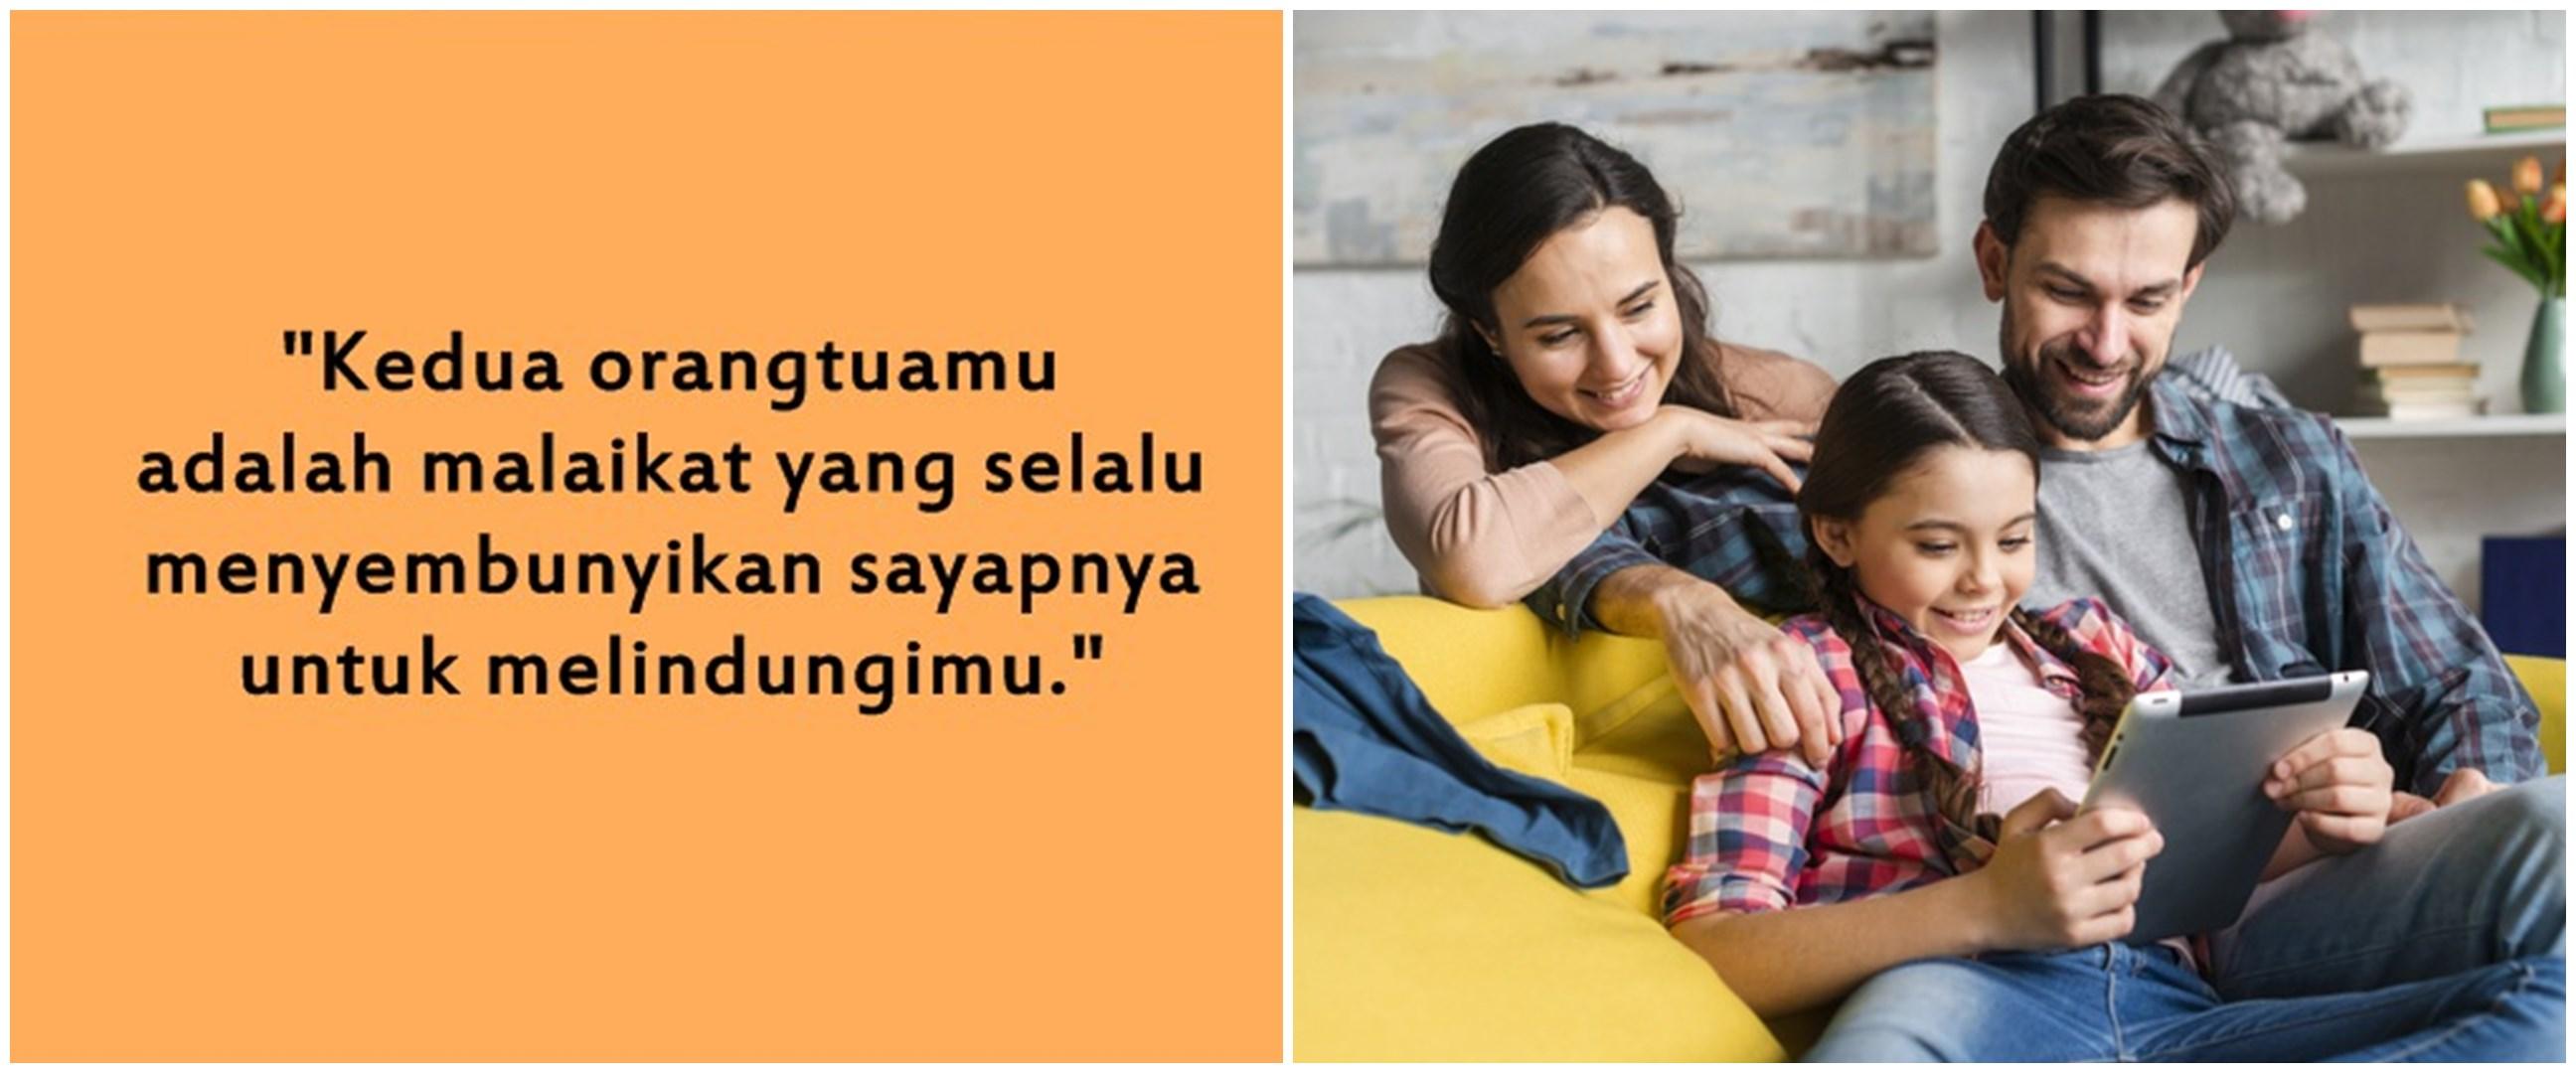 70 Kata-kata mutiara untuk anak, menyentuh hati dan berisi nasihat